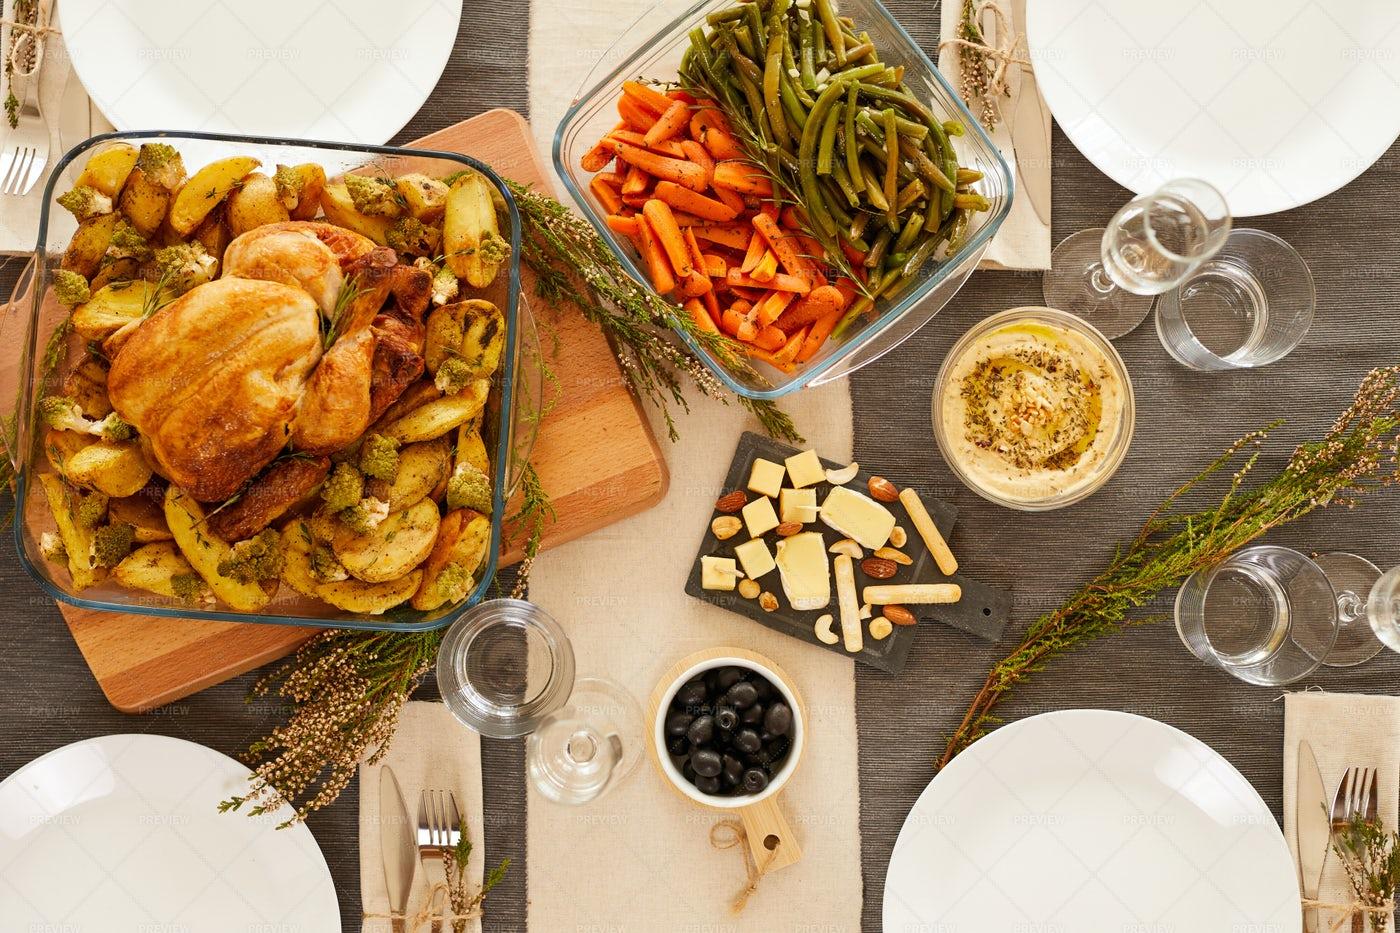 Roast Turkey With Vegetables: Stock Photos